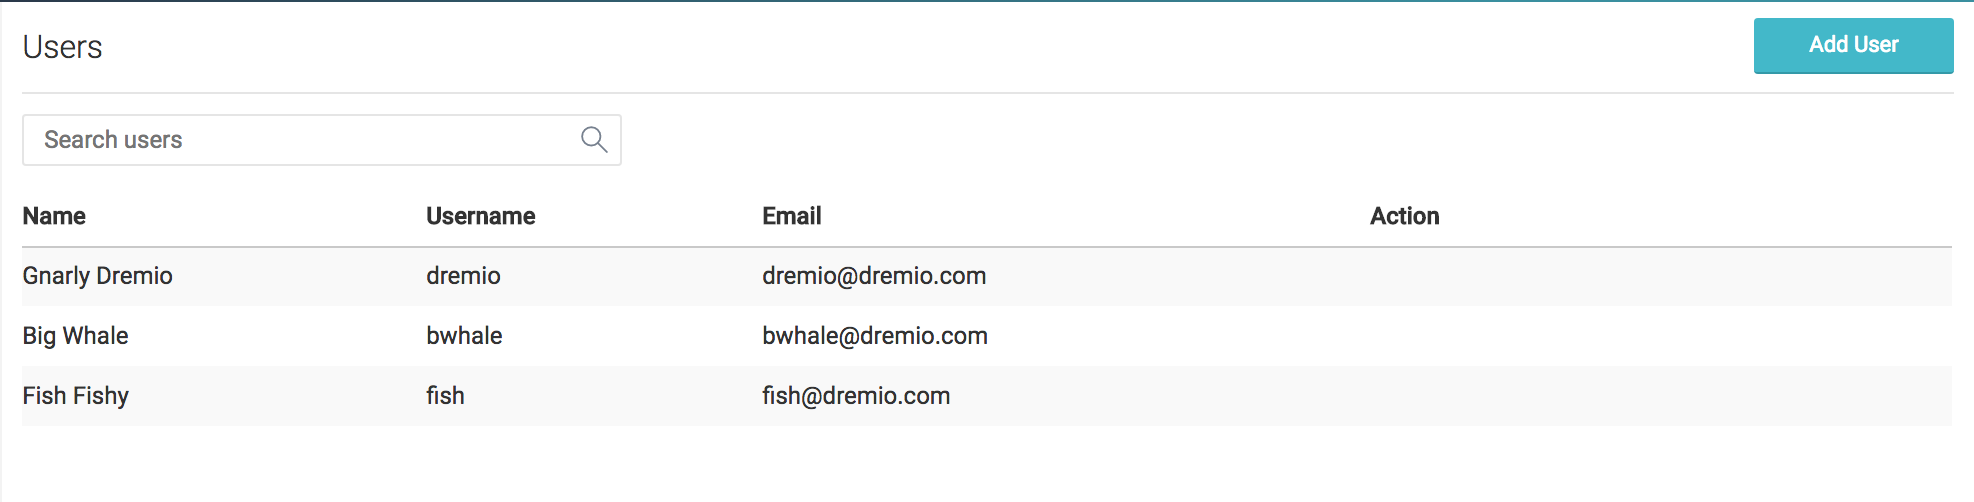 Adding Users to Dremio